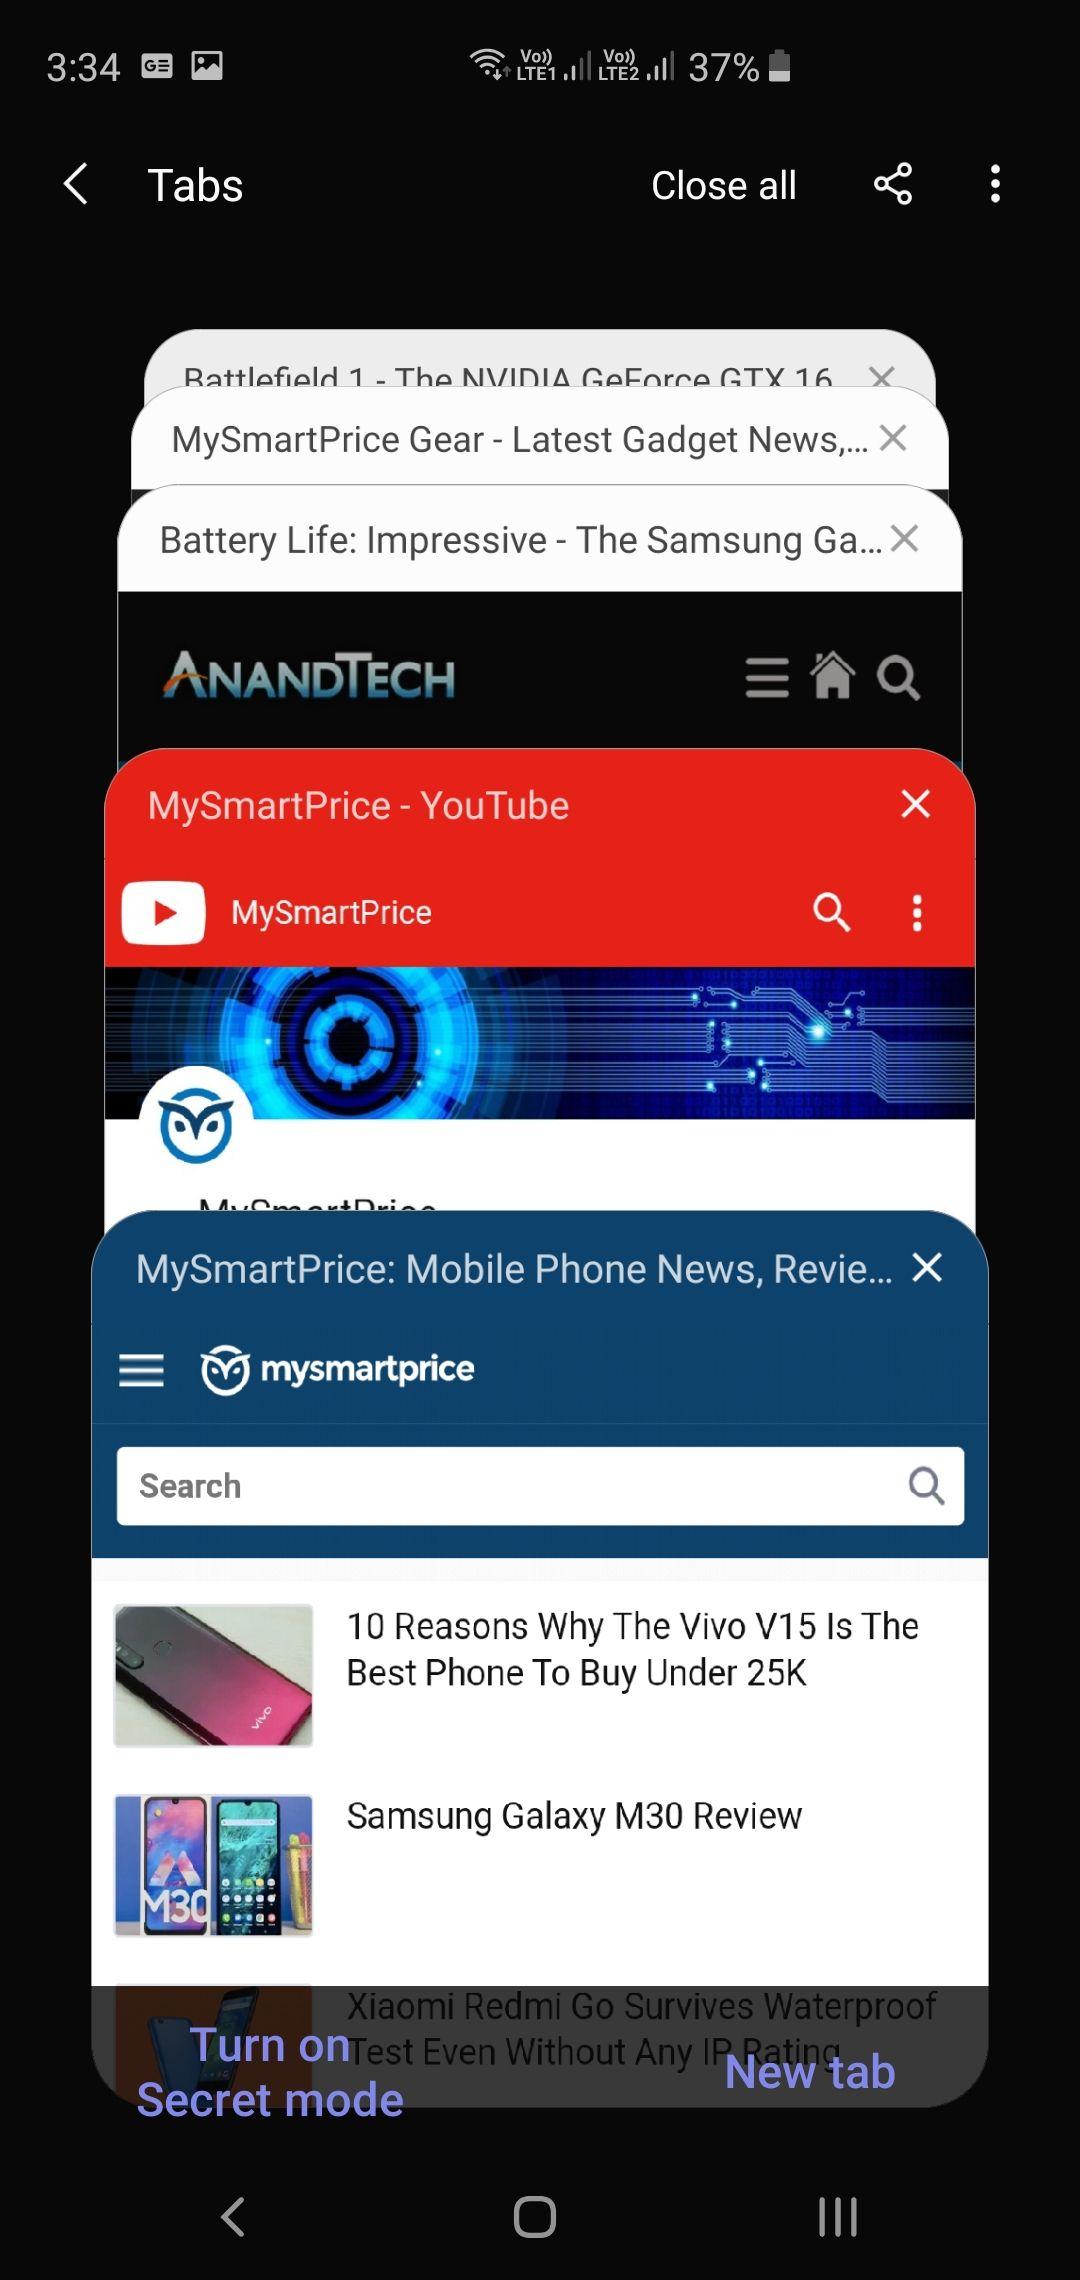 Samsung Galaxy S10+ Samsung Internet App Tabs